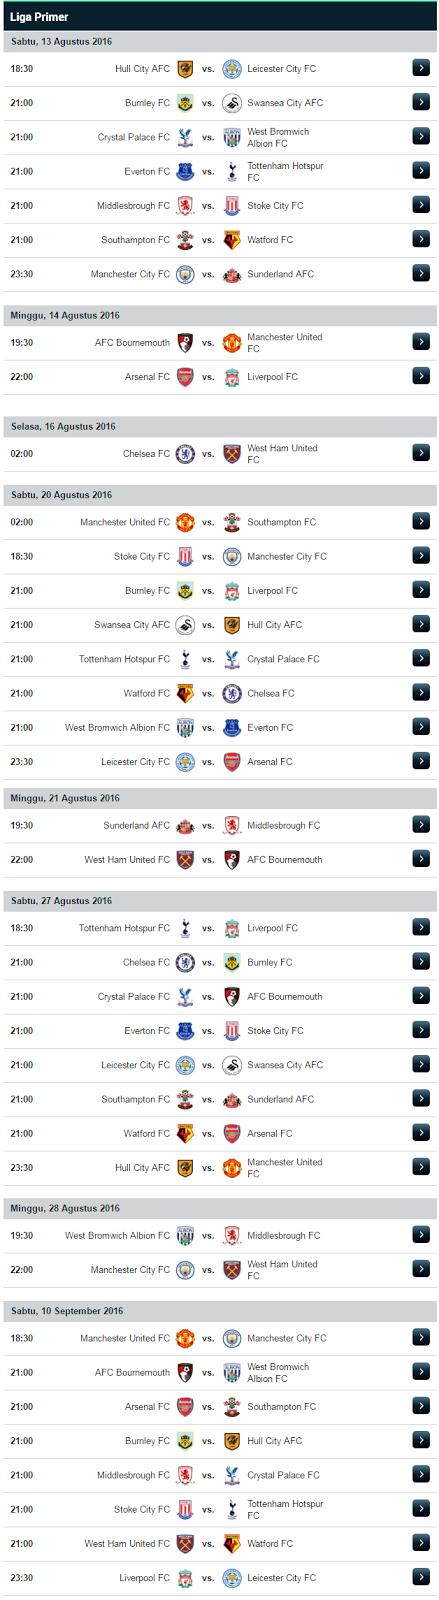 Jadwal Pertandingan Liga Primer Inggris 2016/17 - EPL 2016/17